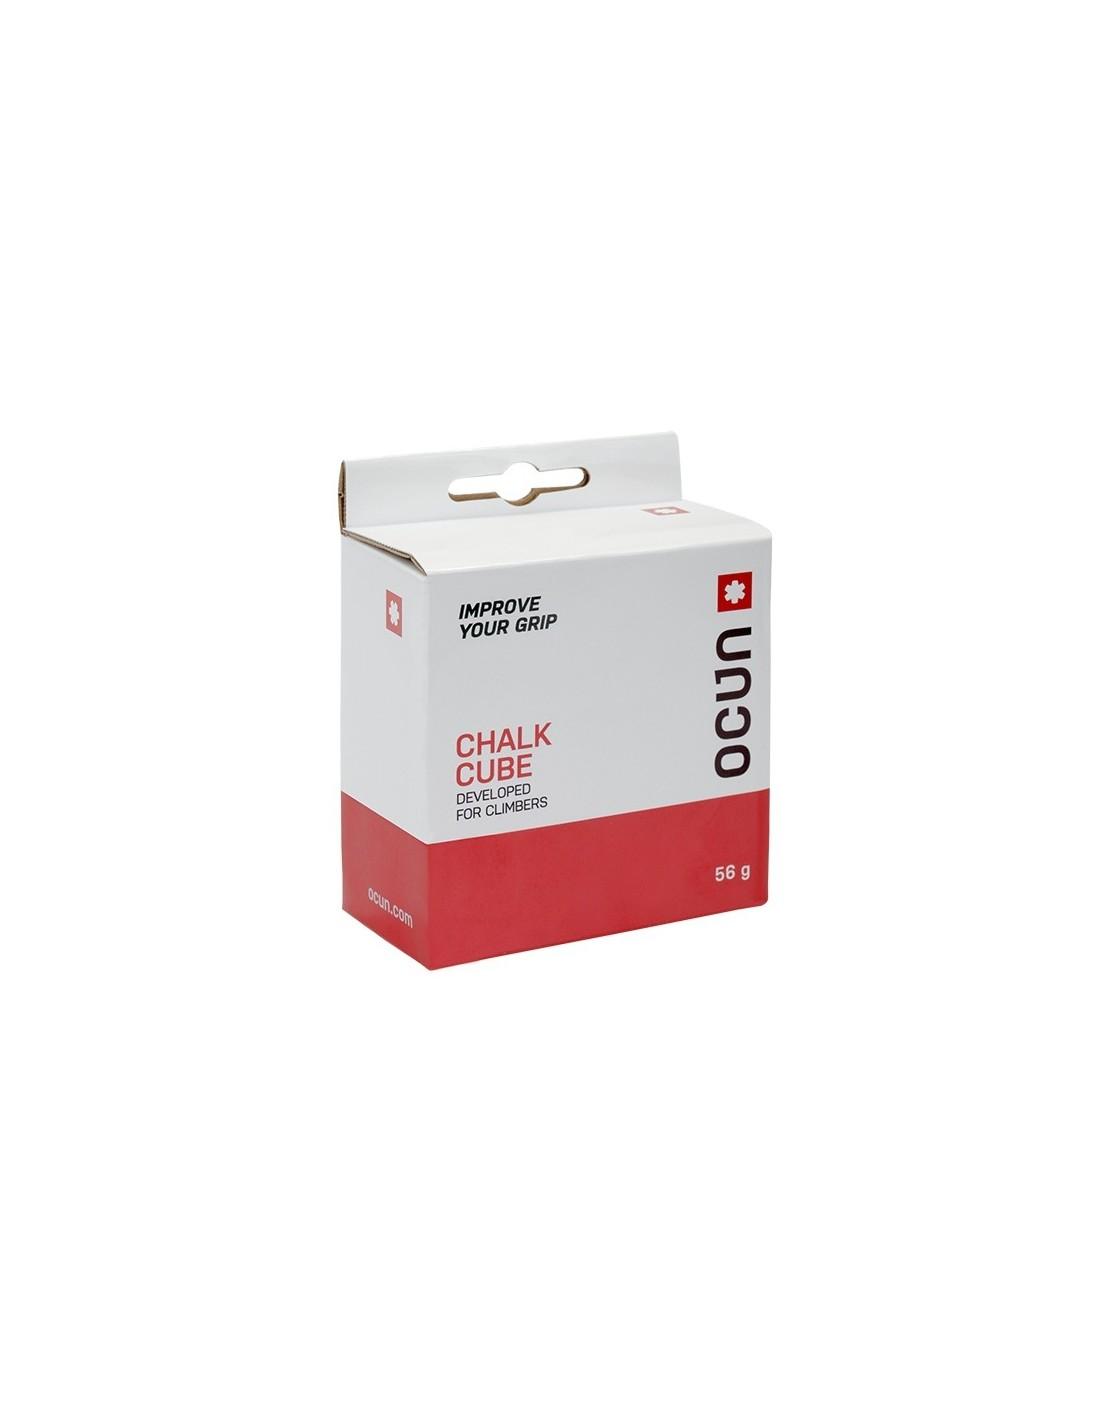 Ocun Chalk Cube 56g Chalkvariante - Loses Chalk , Chalkmenge - 25 - 70 g,